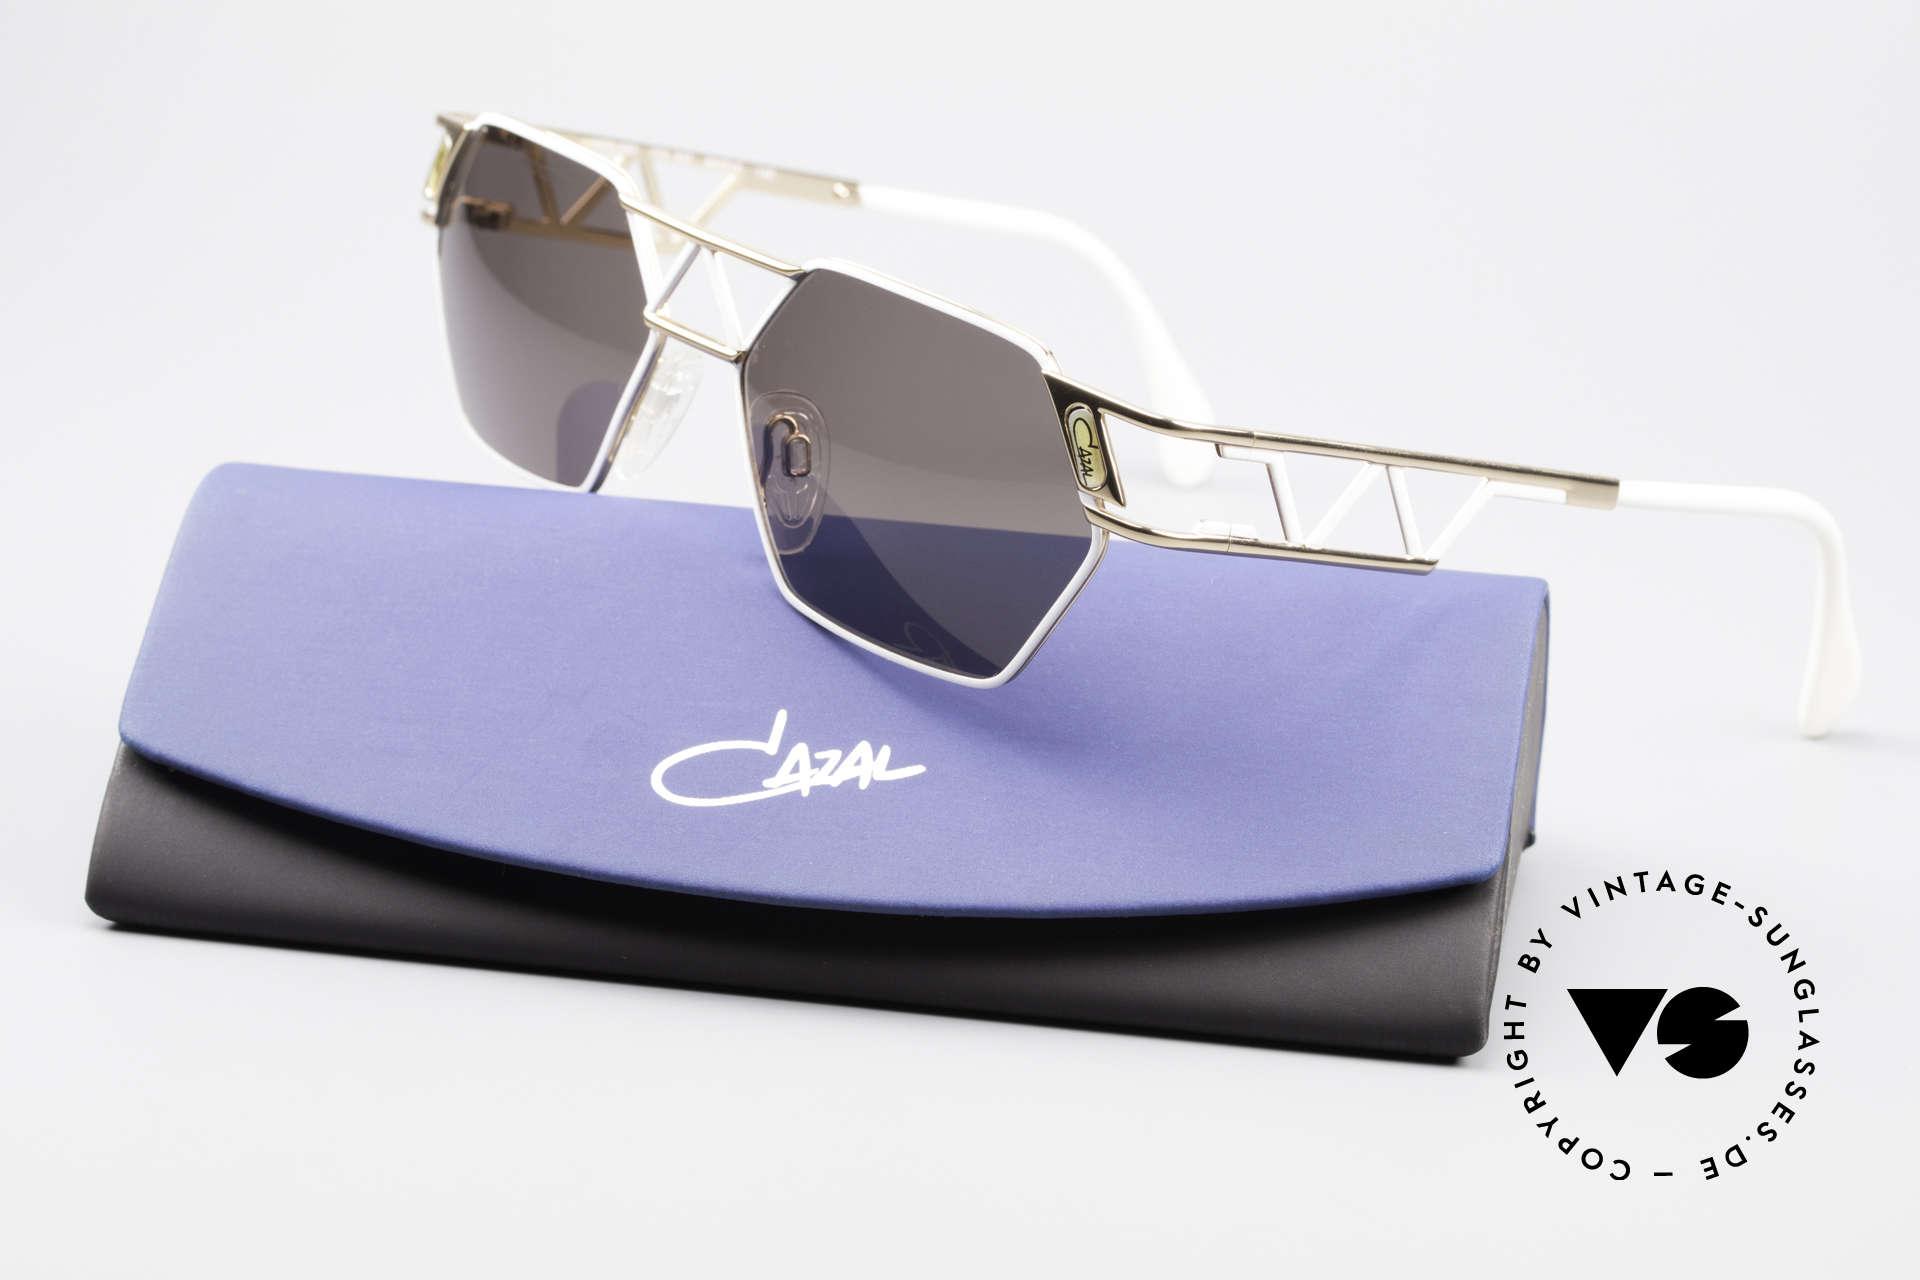 Cazal 960 Rare Designer Sunglasses, Size: large, Made for Men and Women